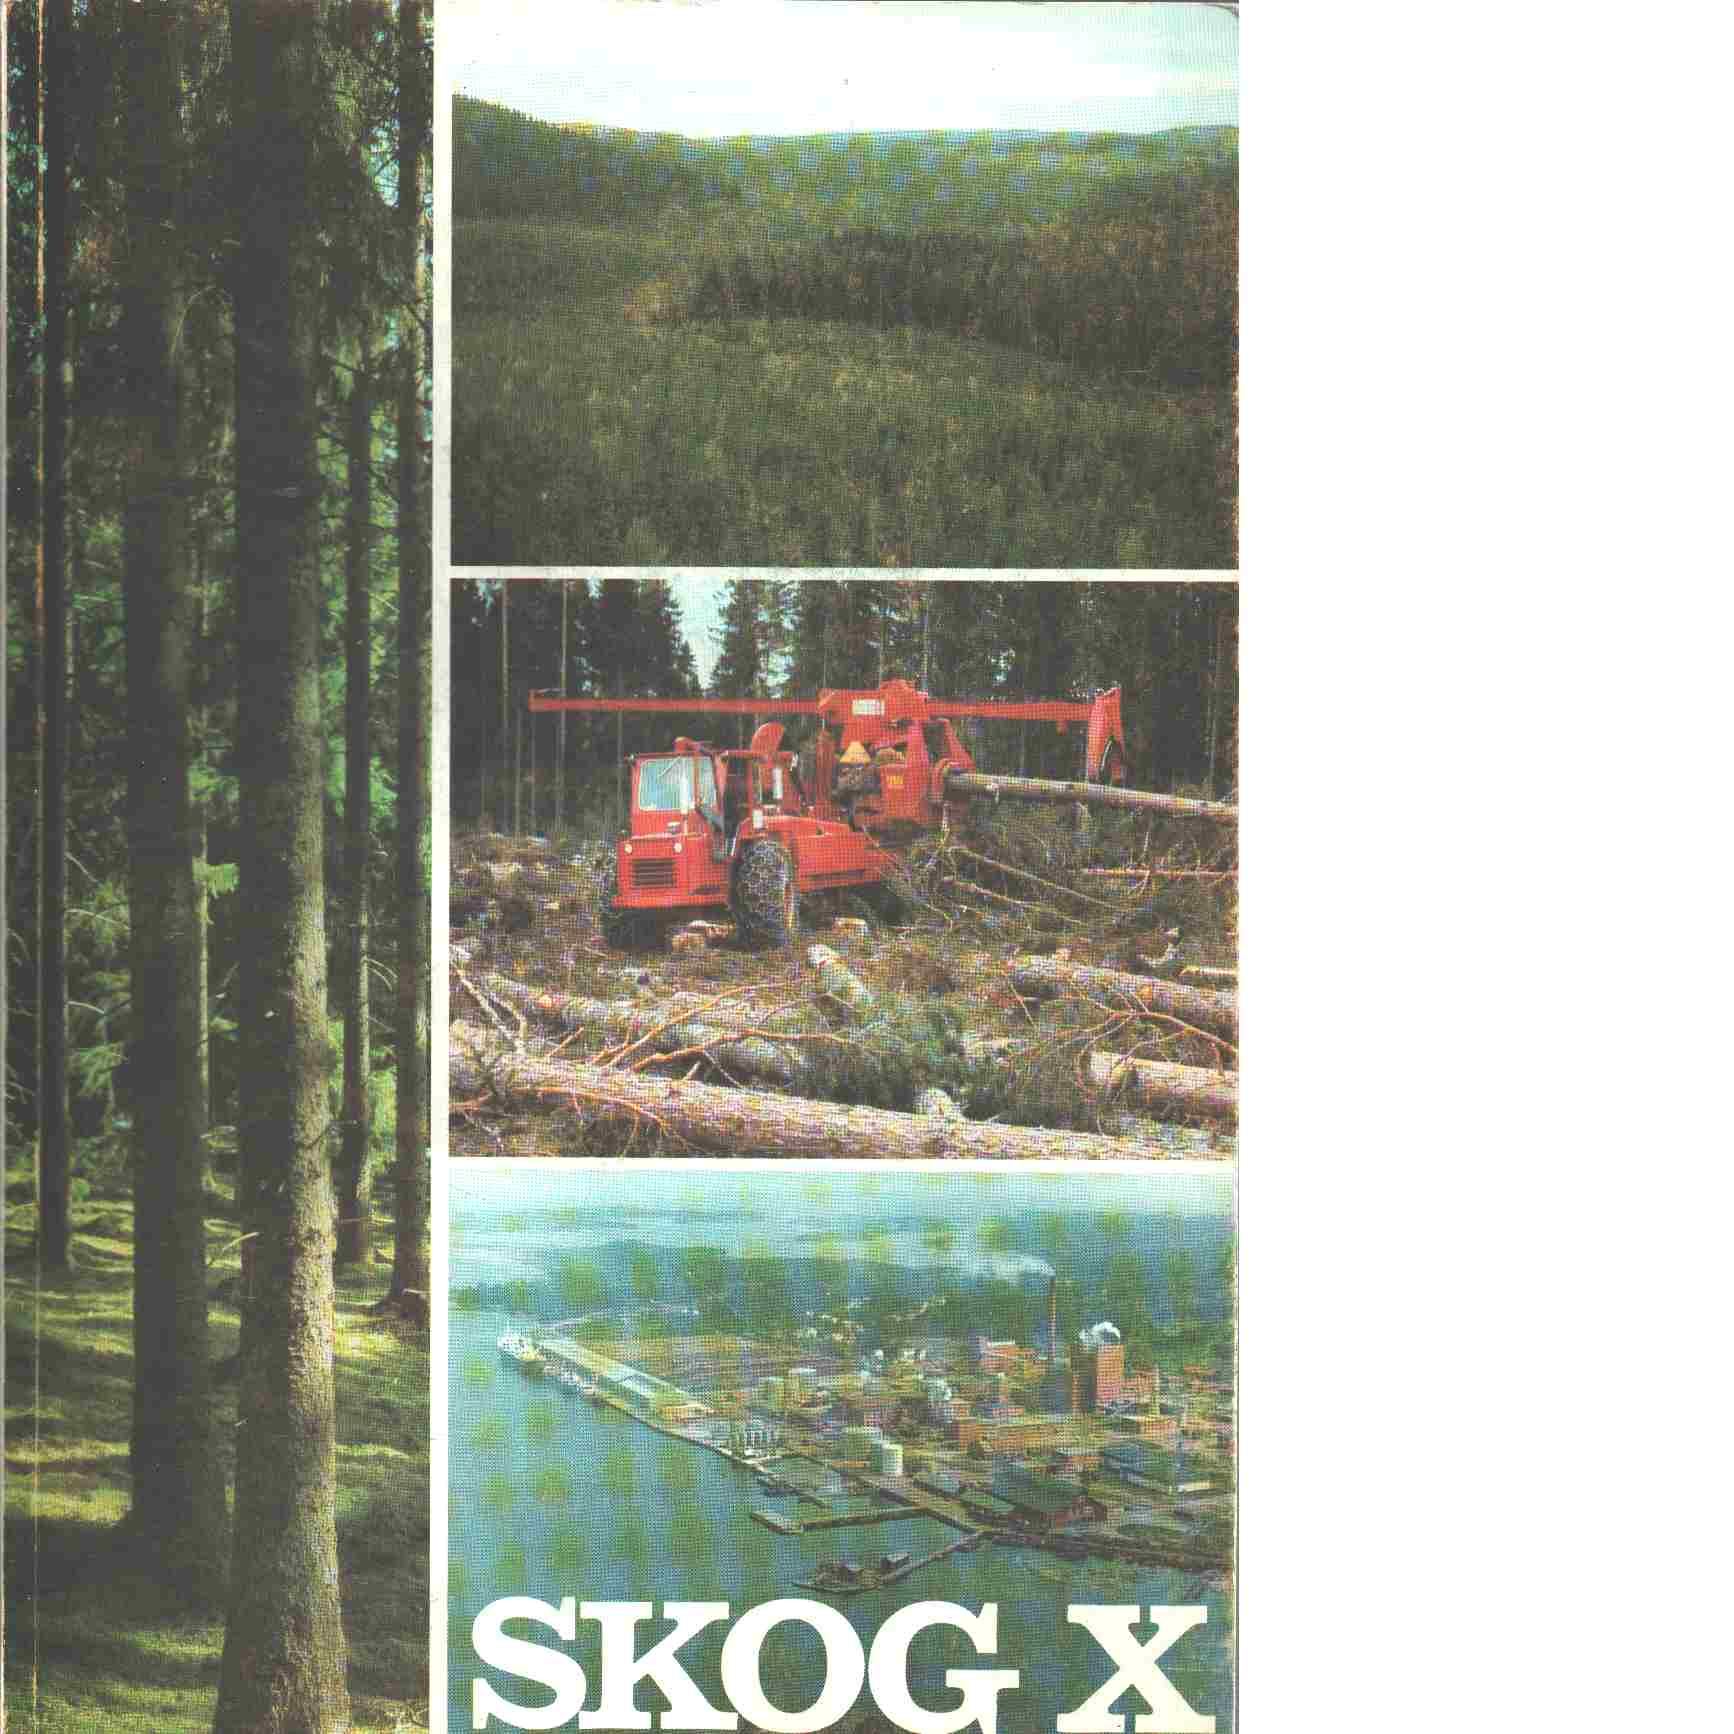 Skog X - Red. Frykman, Bengt